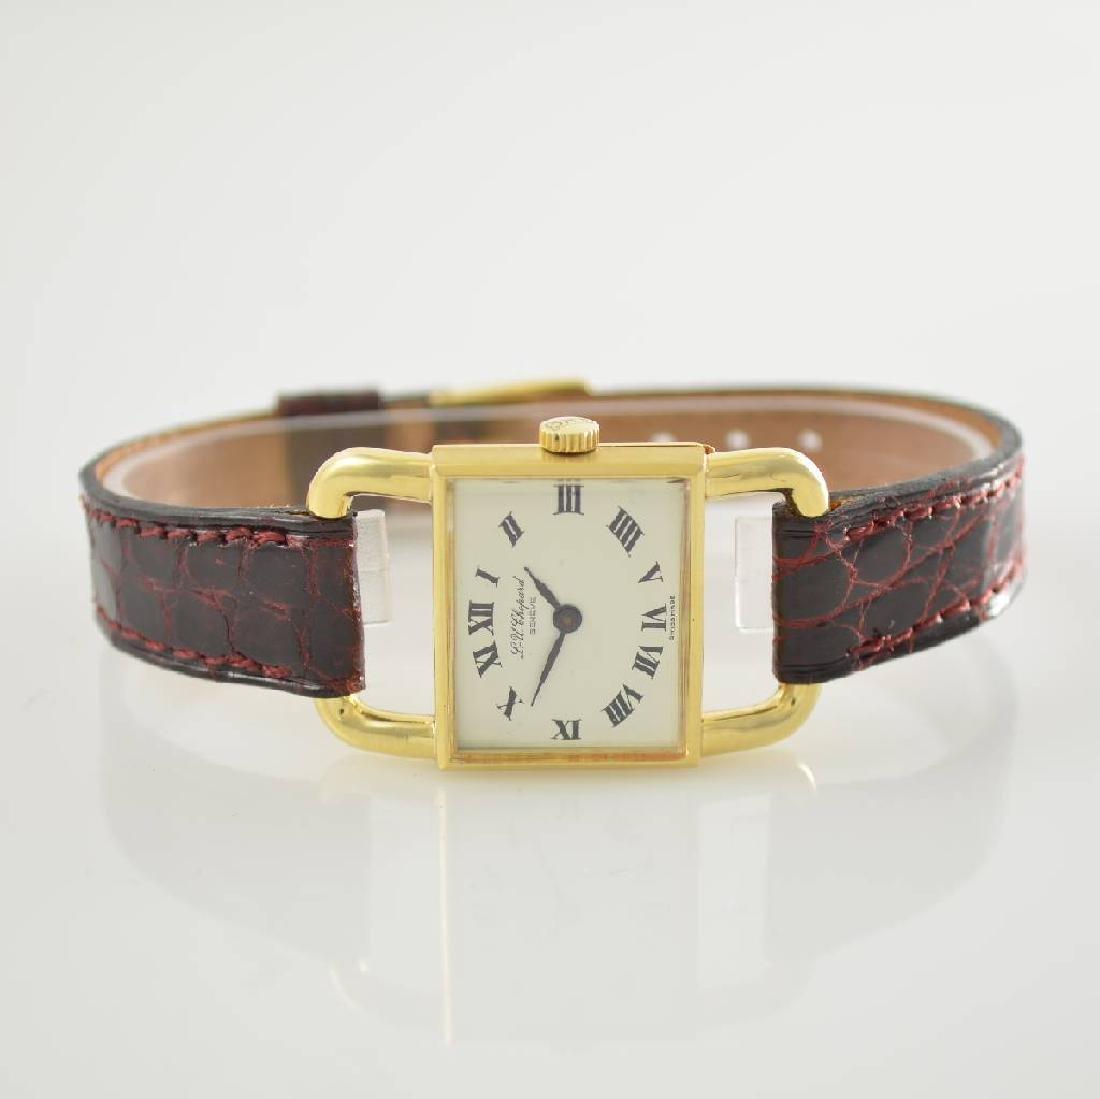 CHOPARD 'Etrier' 18k yellow gold ladies wristwatch